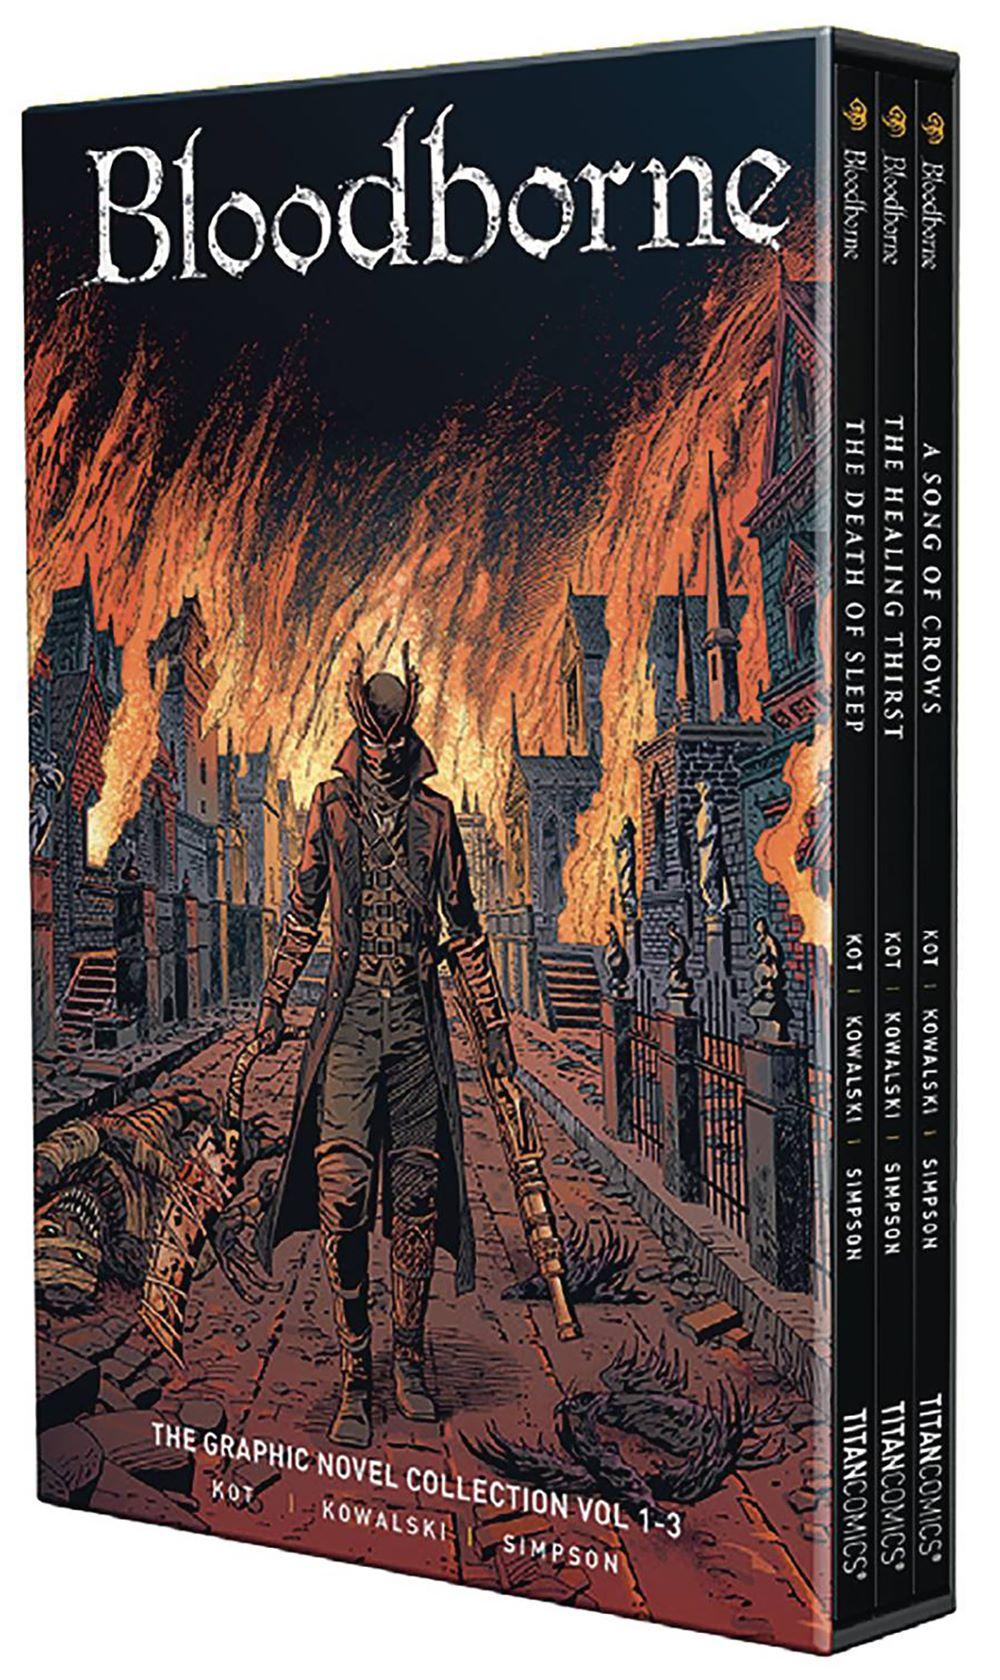 BLOODBORNE-BOXED-SET Titan Comics August 2021 Solicitations